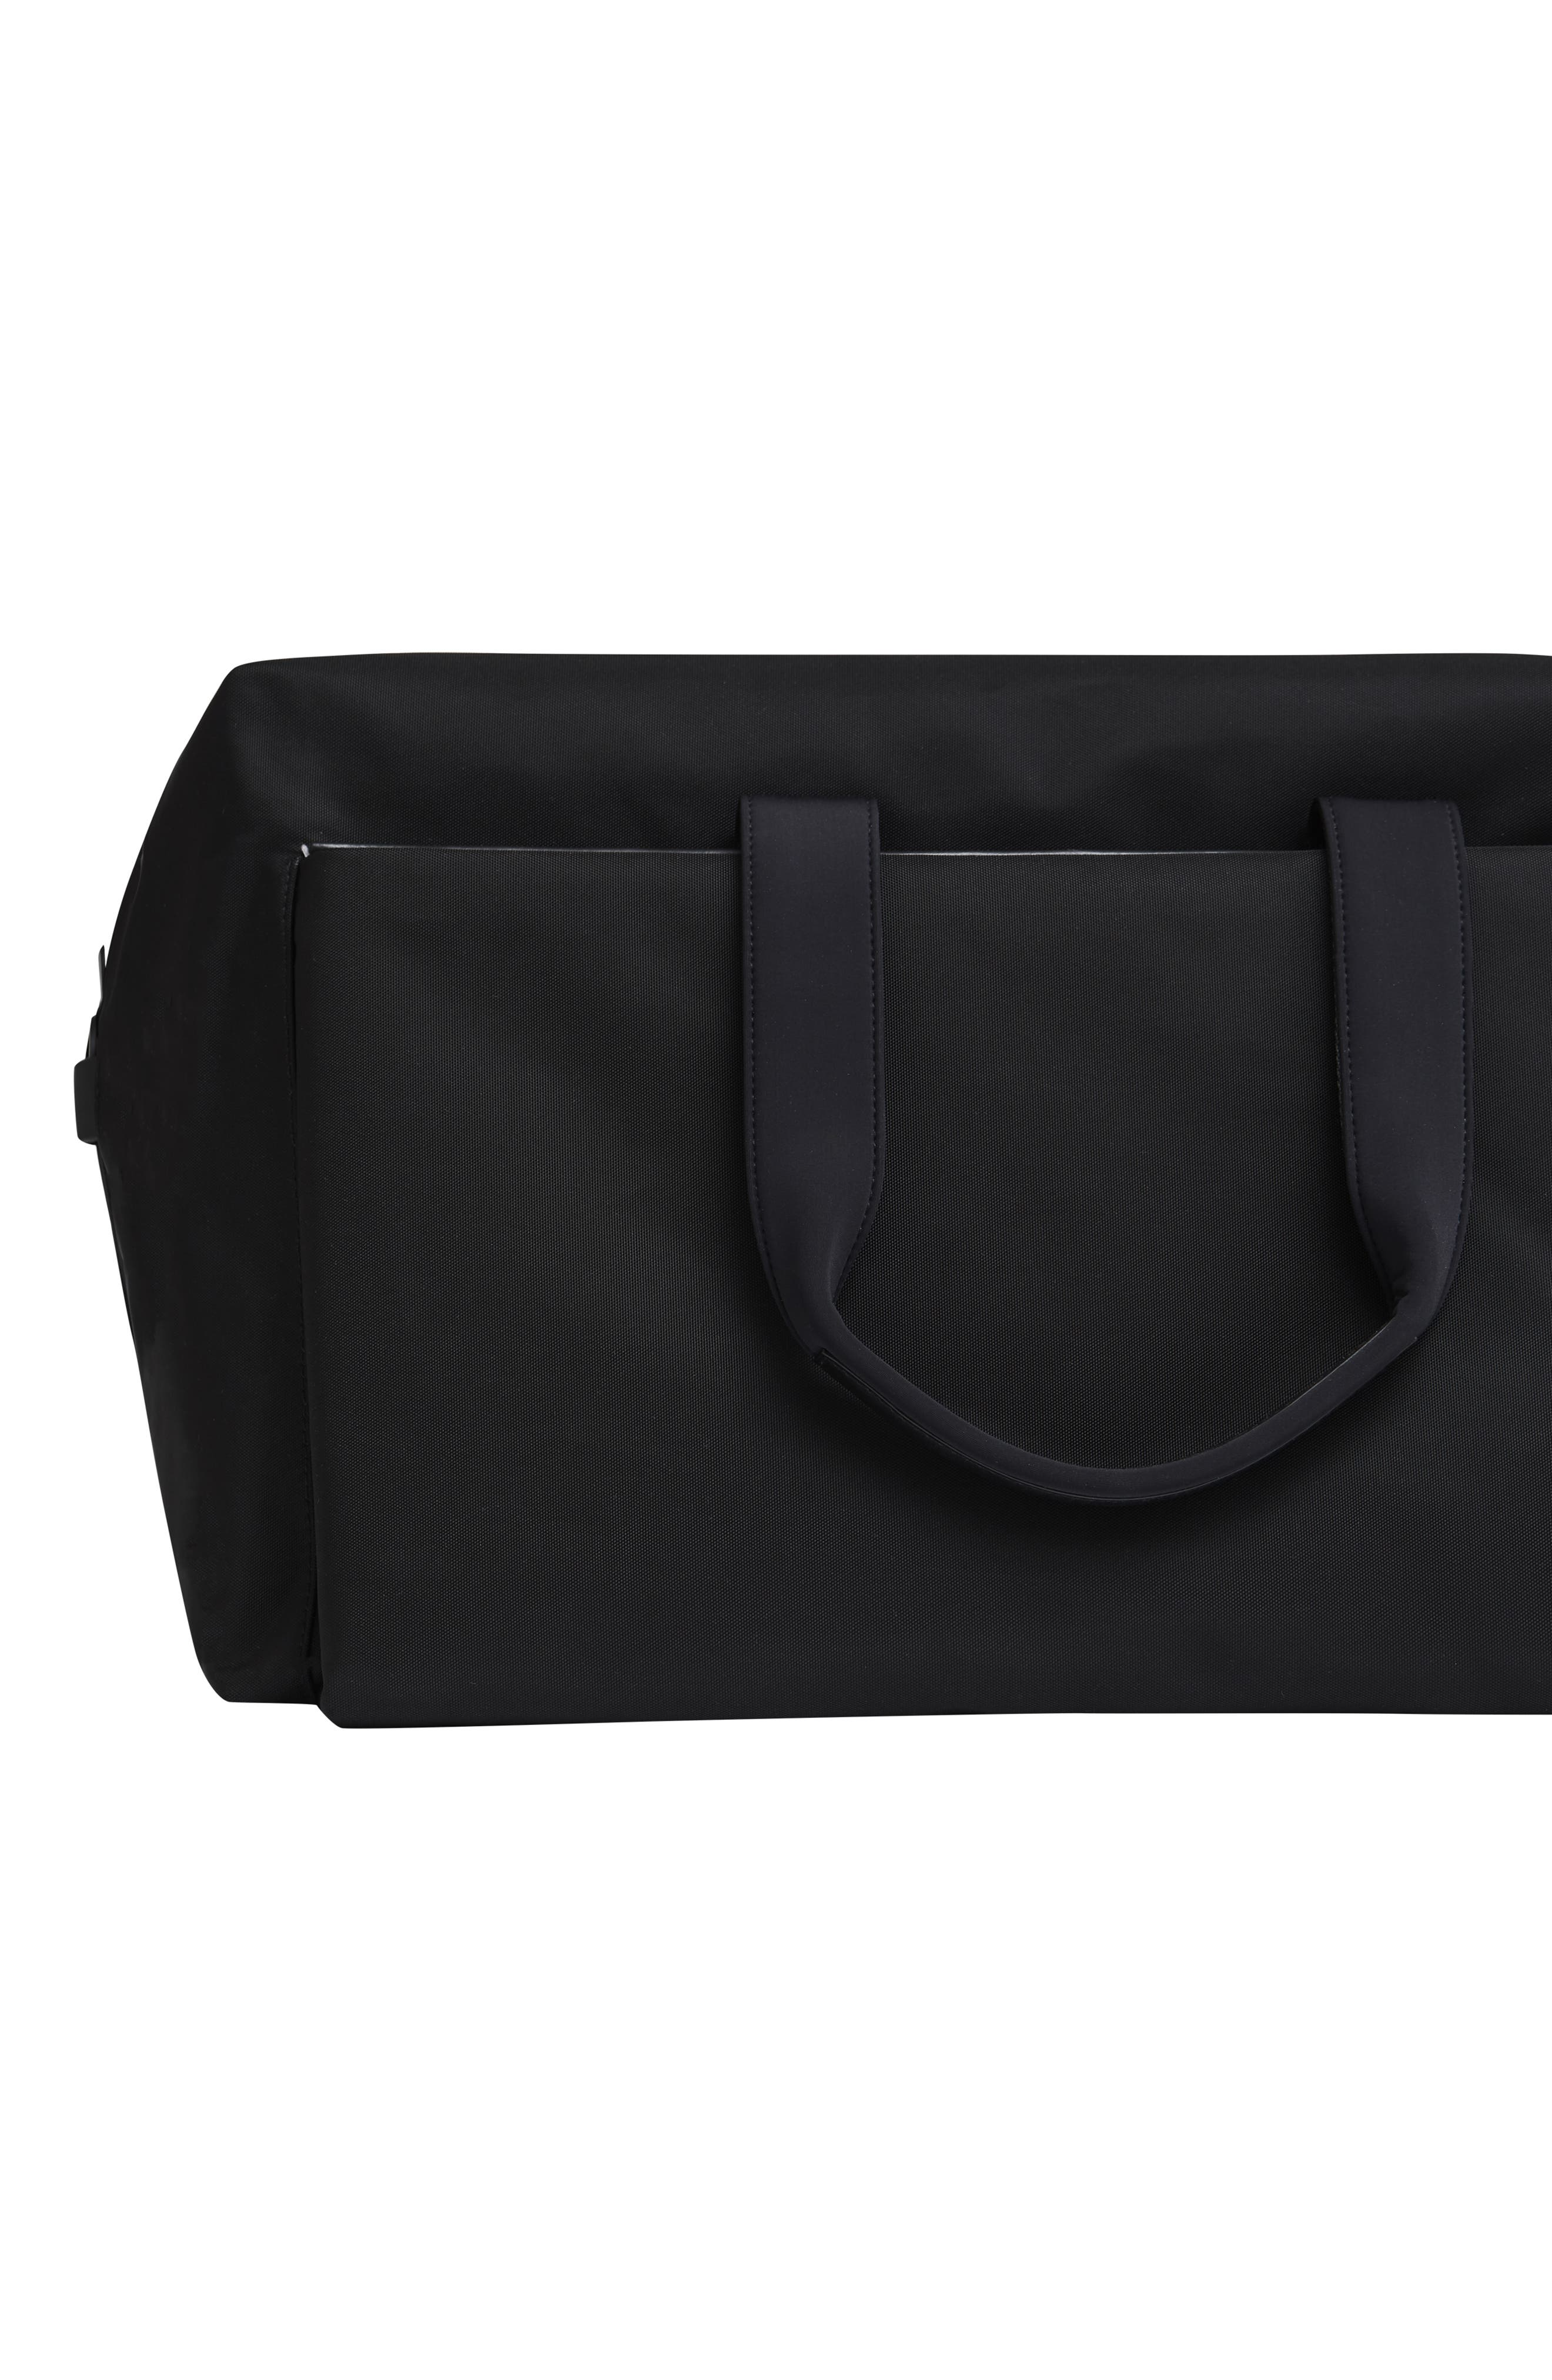 Lightweight Duffel Bag,                             Alternate thumbnail 5, color,                             Black Nylon/ Black Leather